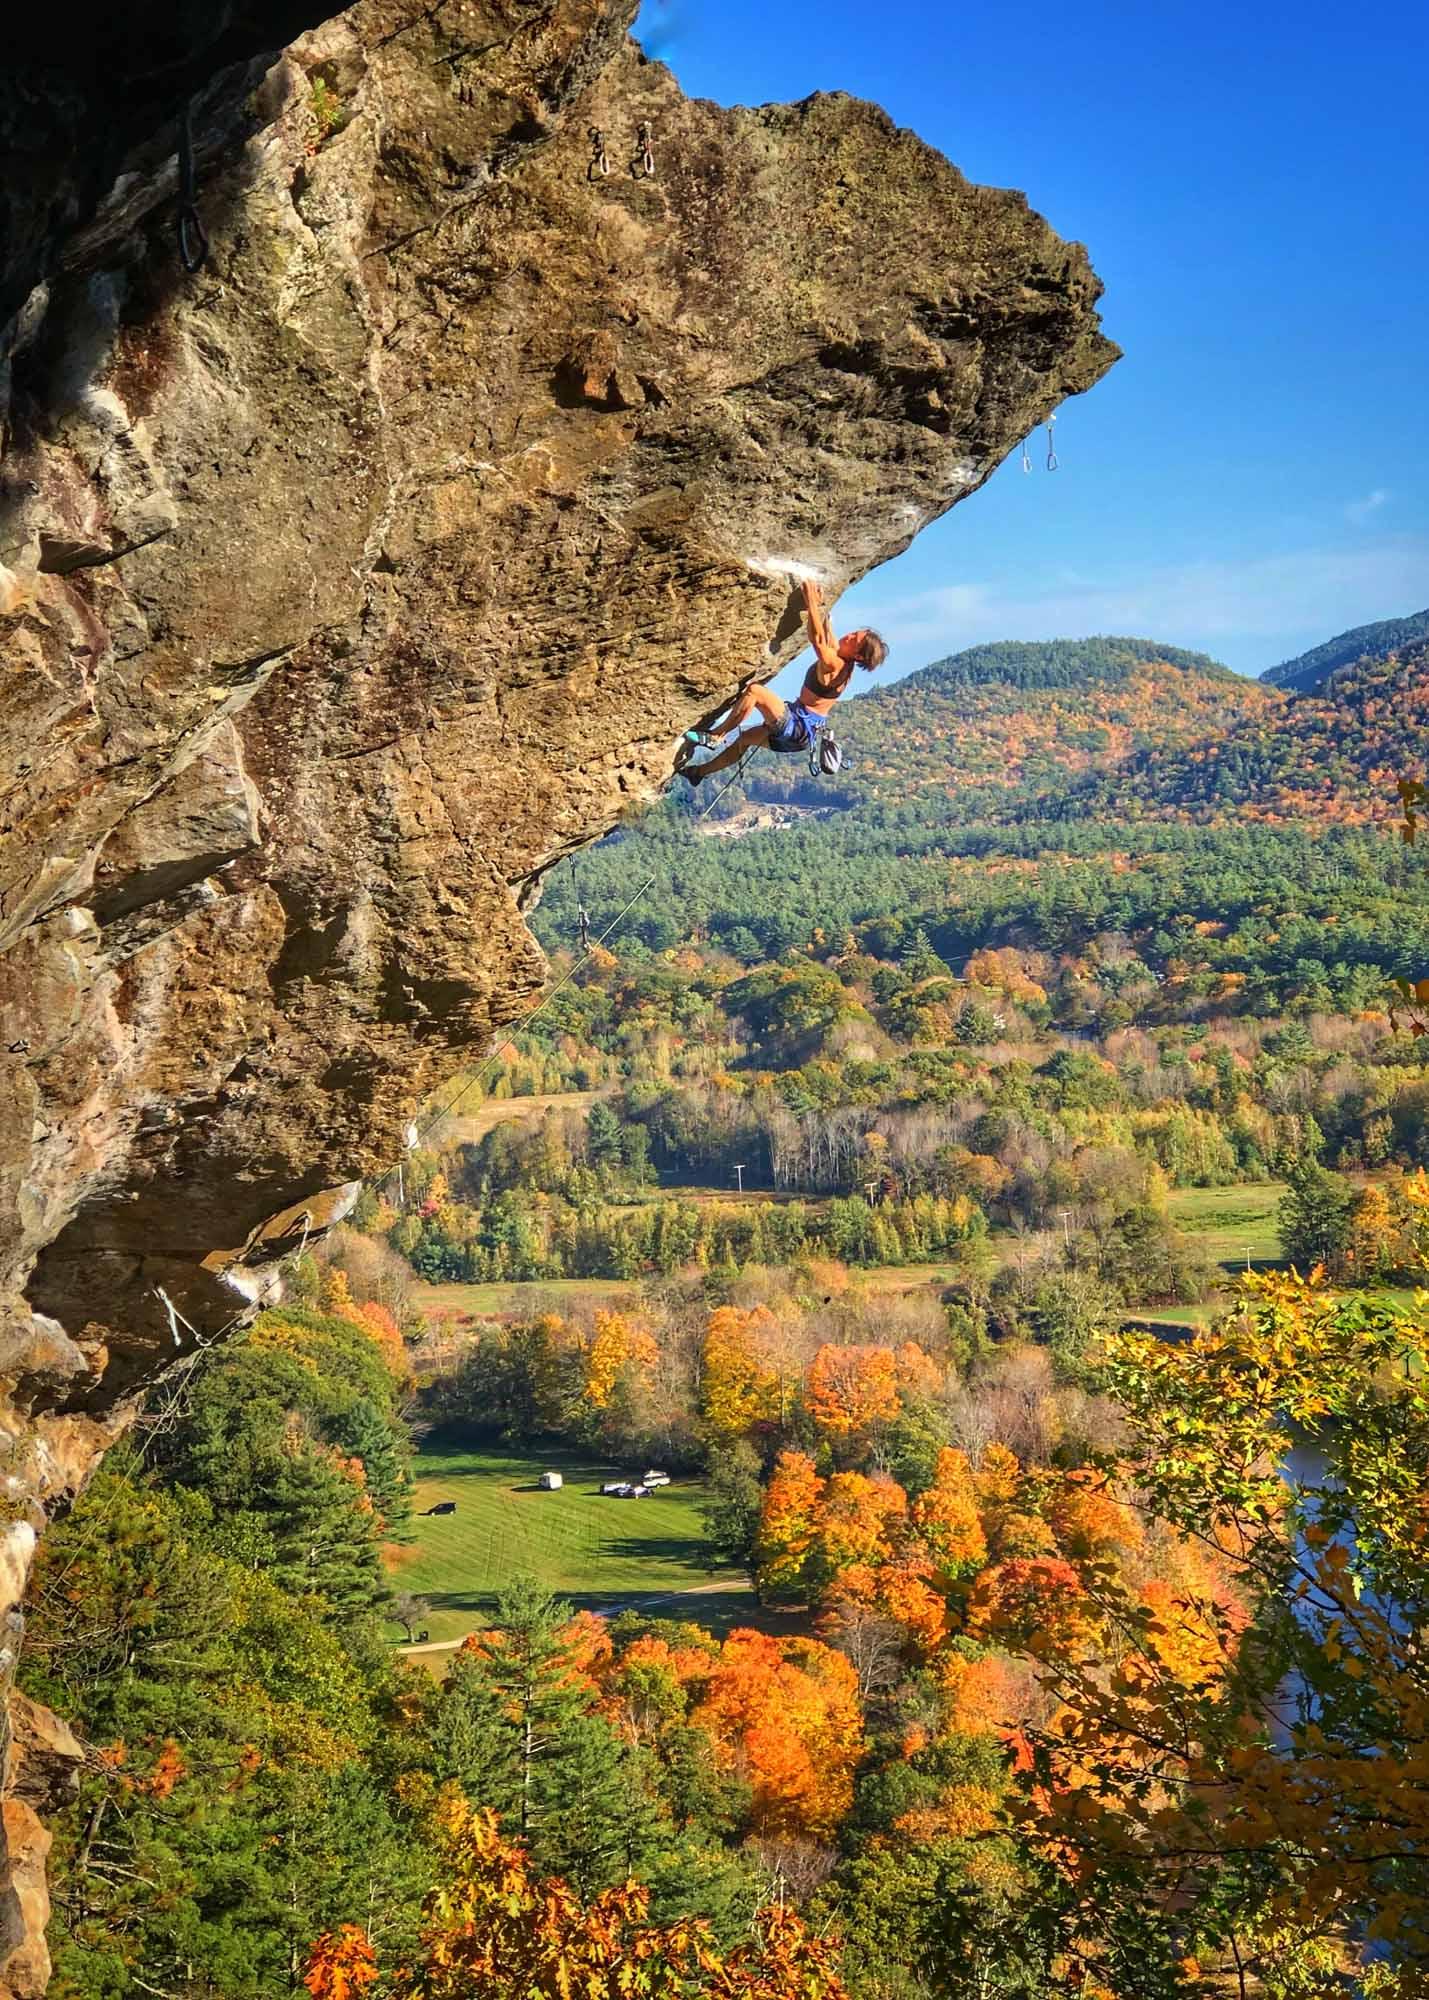 grimpeuses-au-sommet-Quebecs-Women-Climbers-New-Heights-Predator-5.13a-Rumney-NH-Photo-Benoit-Leblanc